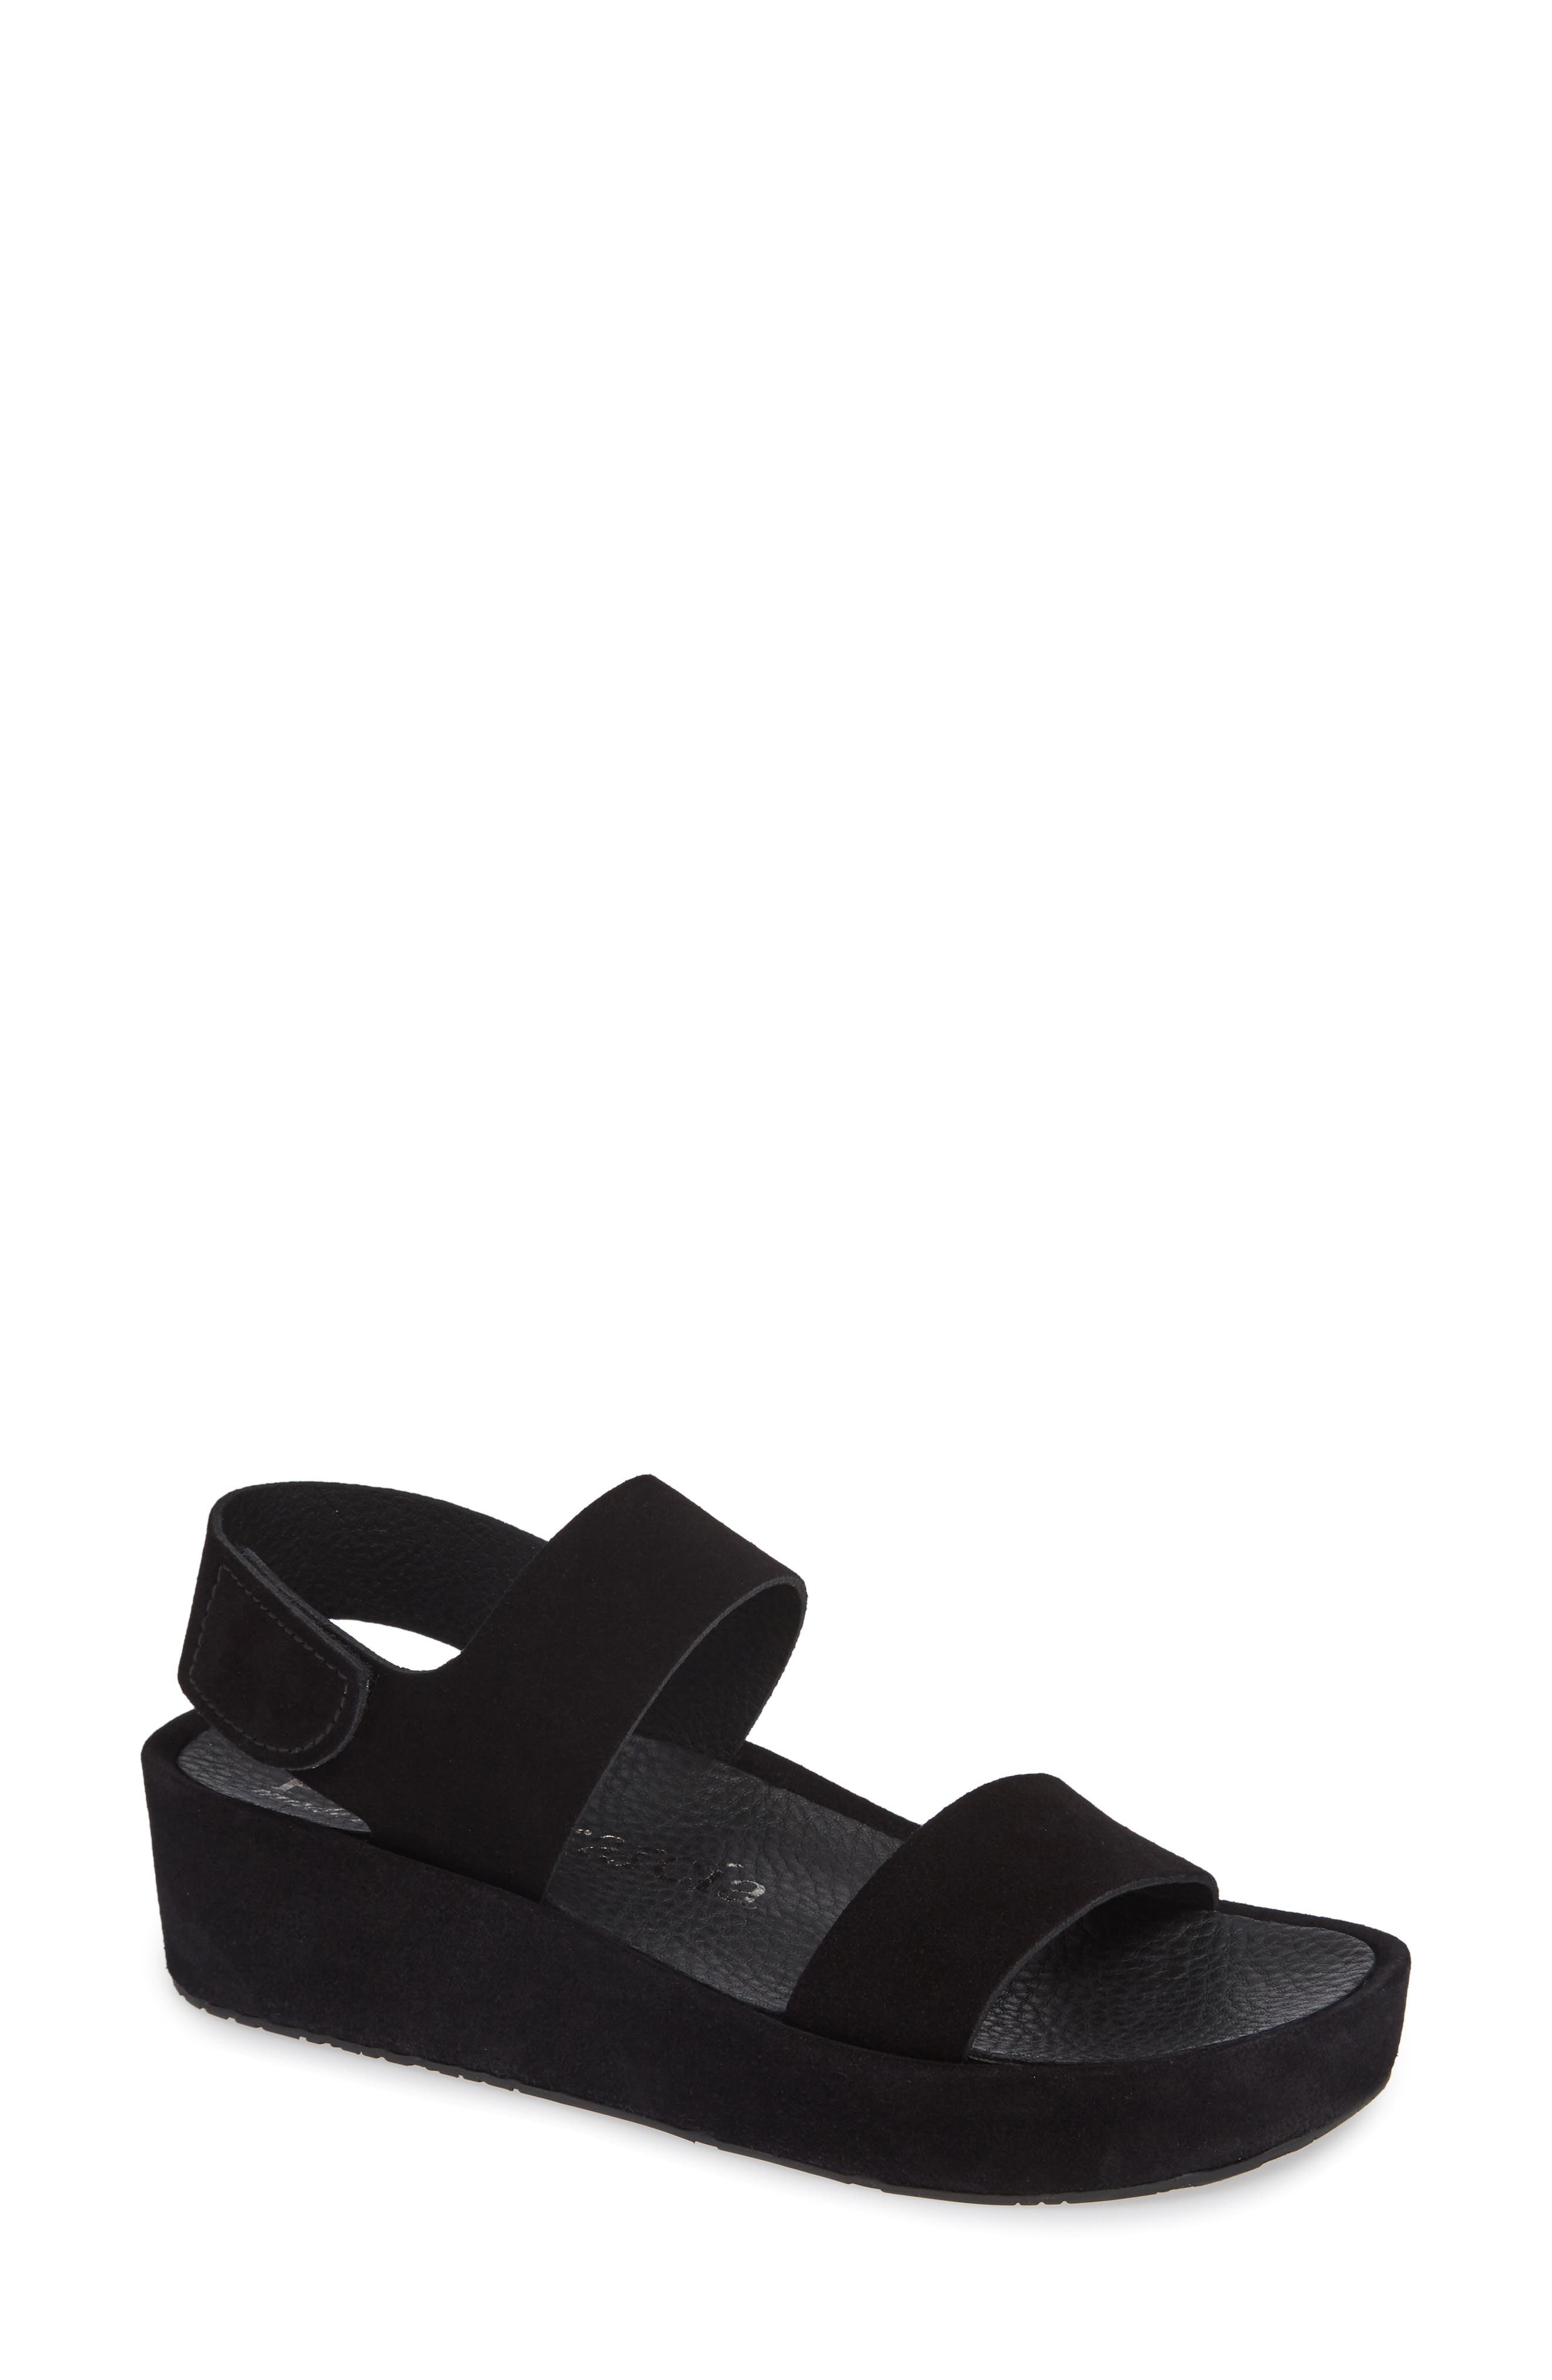 Lacey Footbed Sandal,                             Main thumbnail 1, color,                             BLACK CASTORO